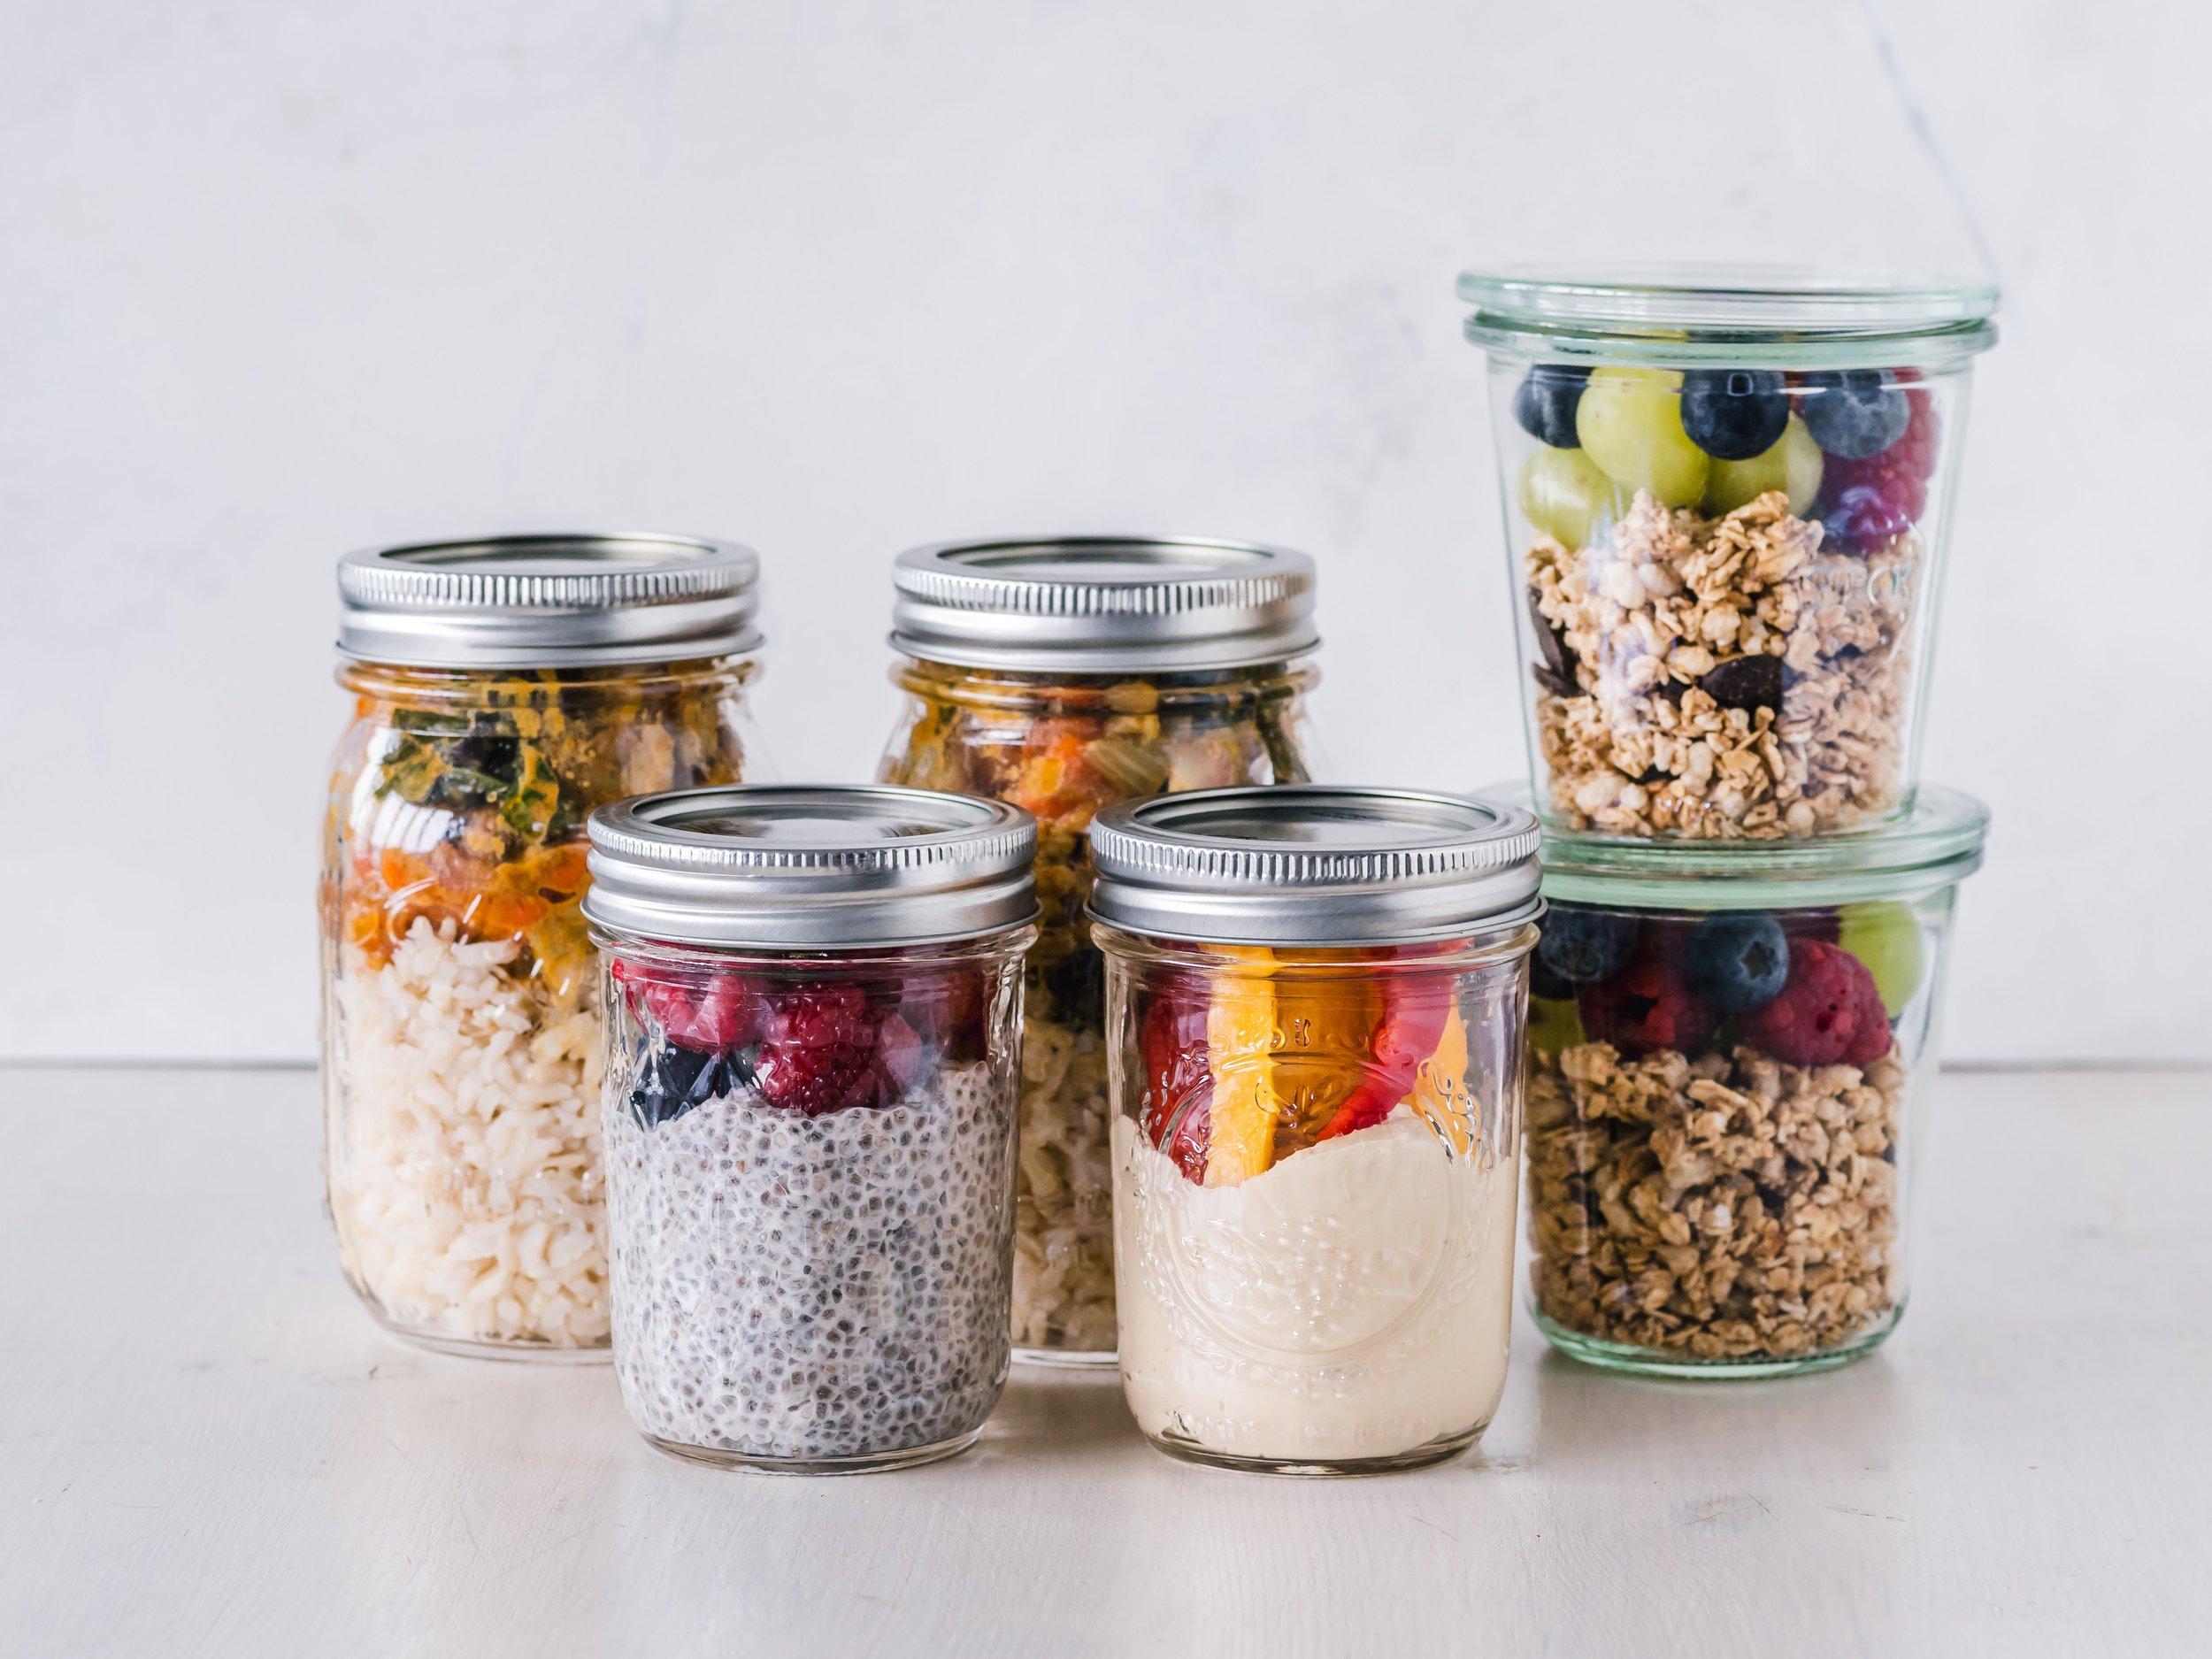 4 - SHOP SMART: Bulk FoodS & Produce